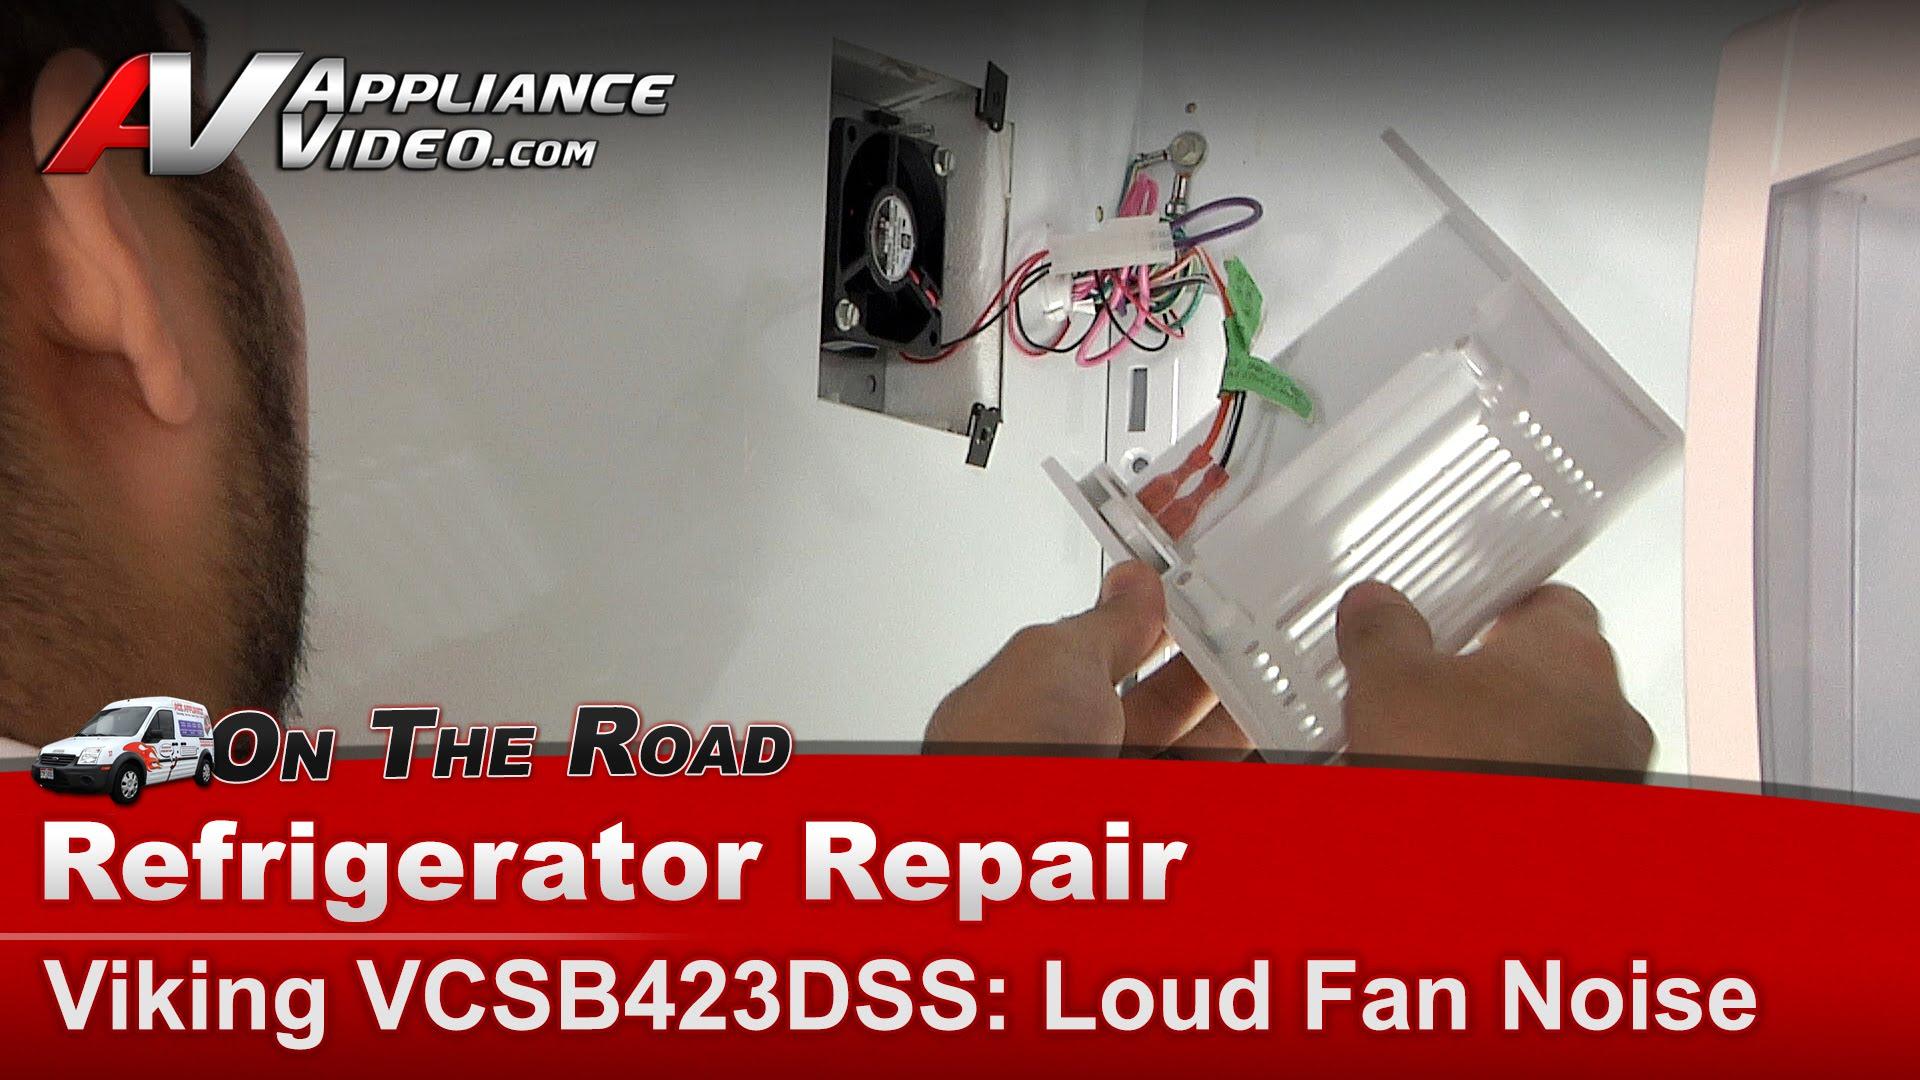 Viking Vcsb423dss Refrigerator Diagnostic Repair Loud